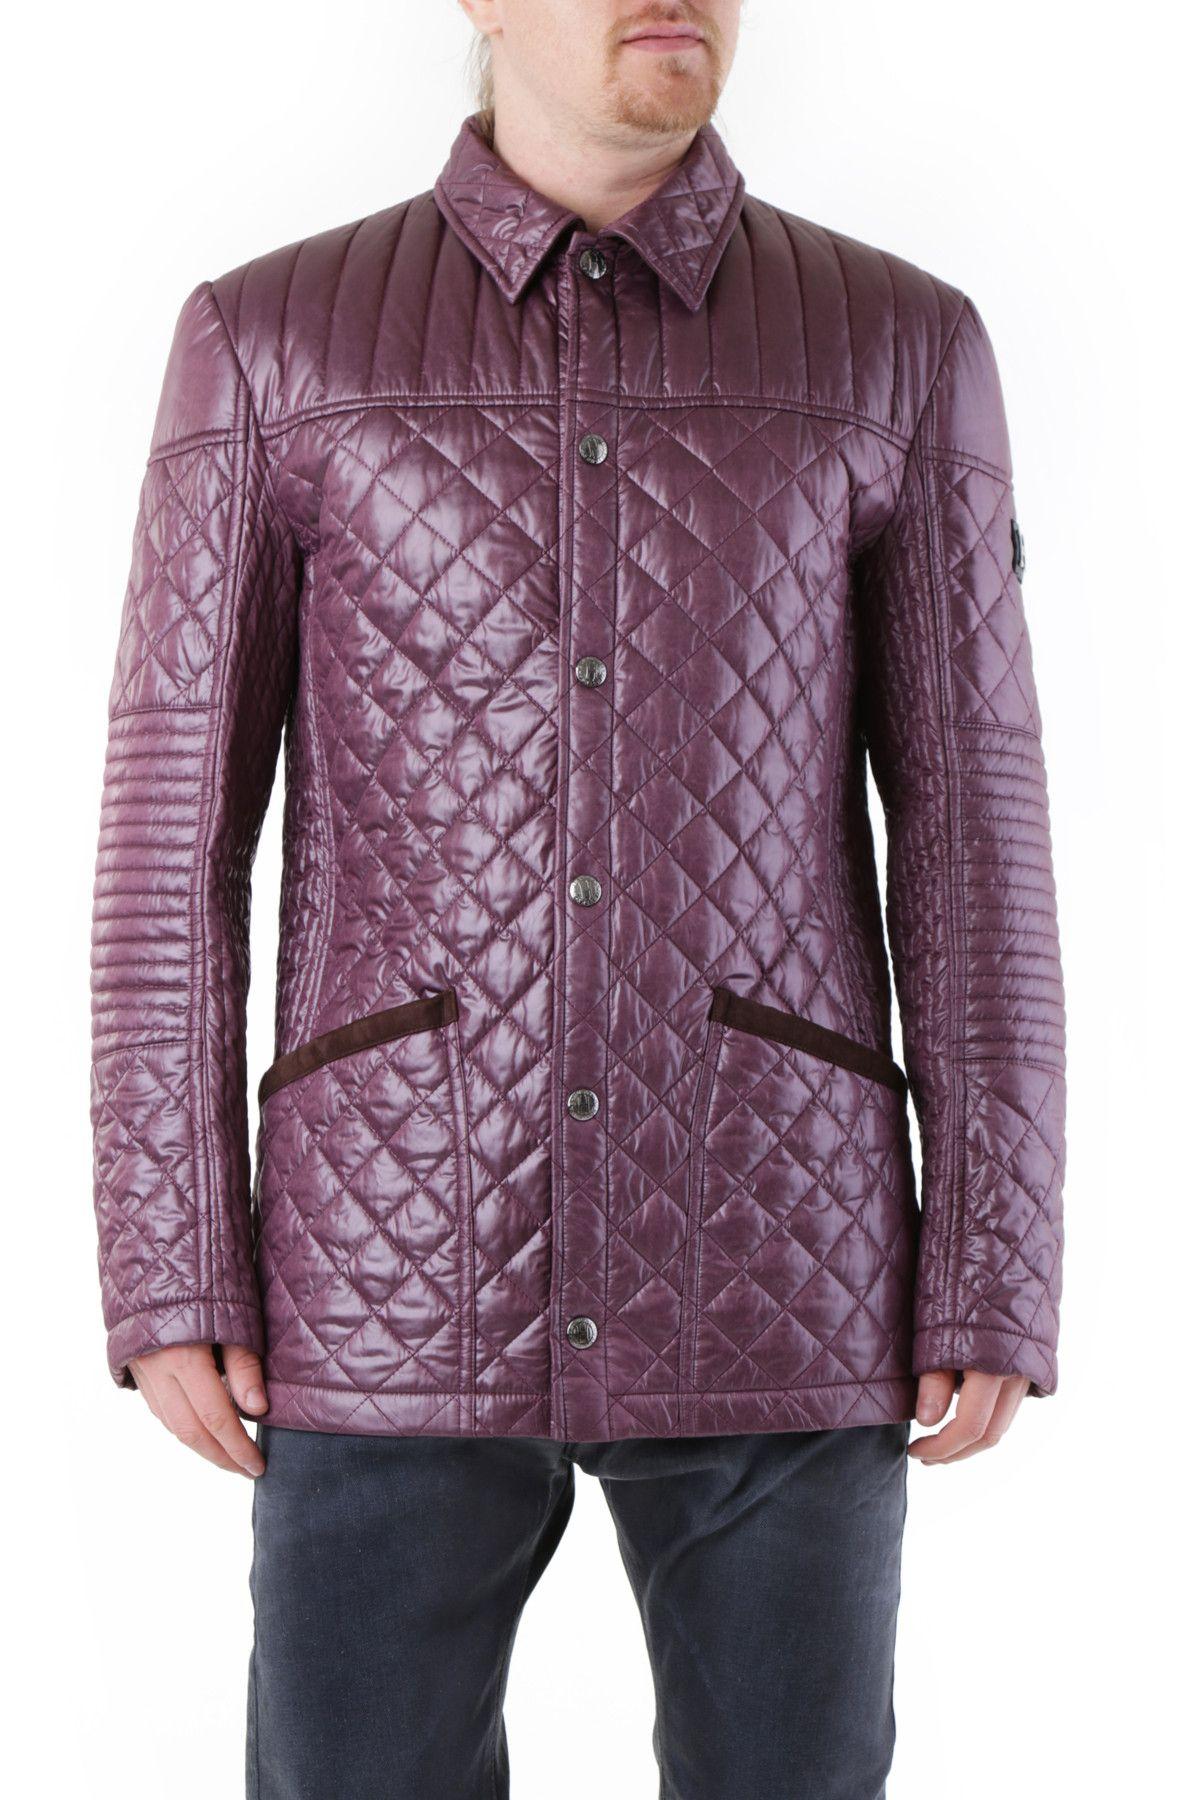 Husky Men's Jacket In Purple